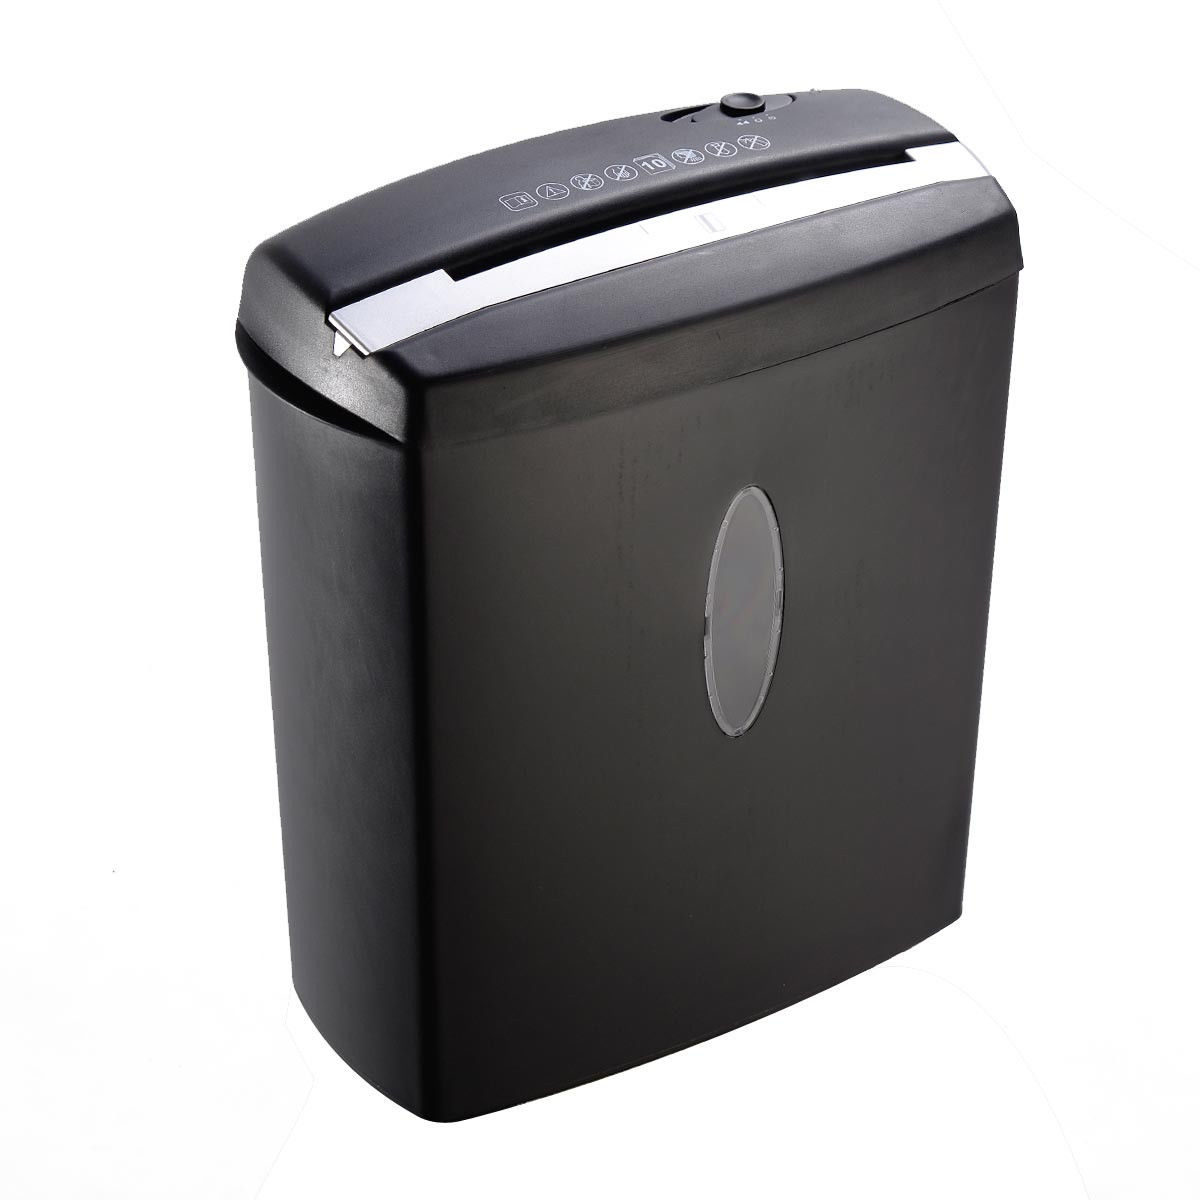 GHP 10-Sheet Capacity Black Cross Cut Paper Shredder w 3.96 Gallon Capacity Wastebin